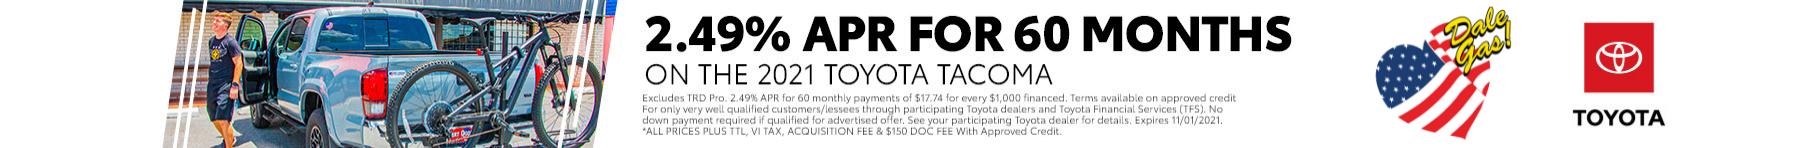 2.49% APR on the 2021 Toyota Tacoma   Bert Ogden Toyota in Harlingen, Texas